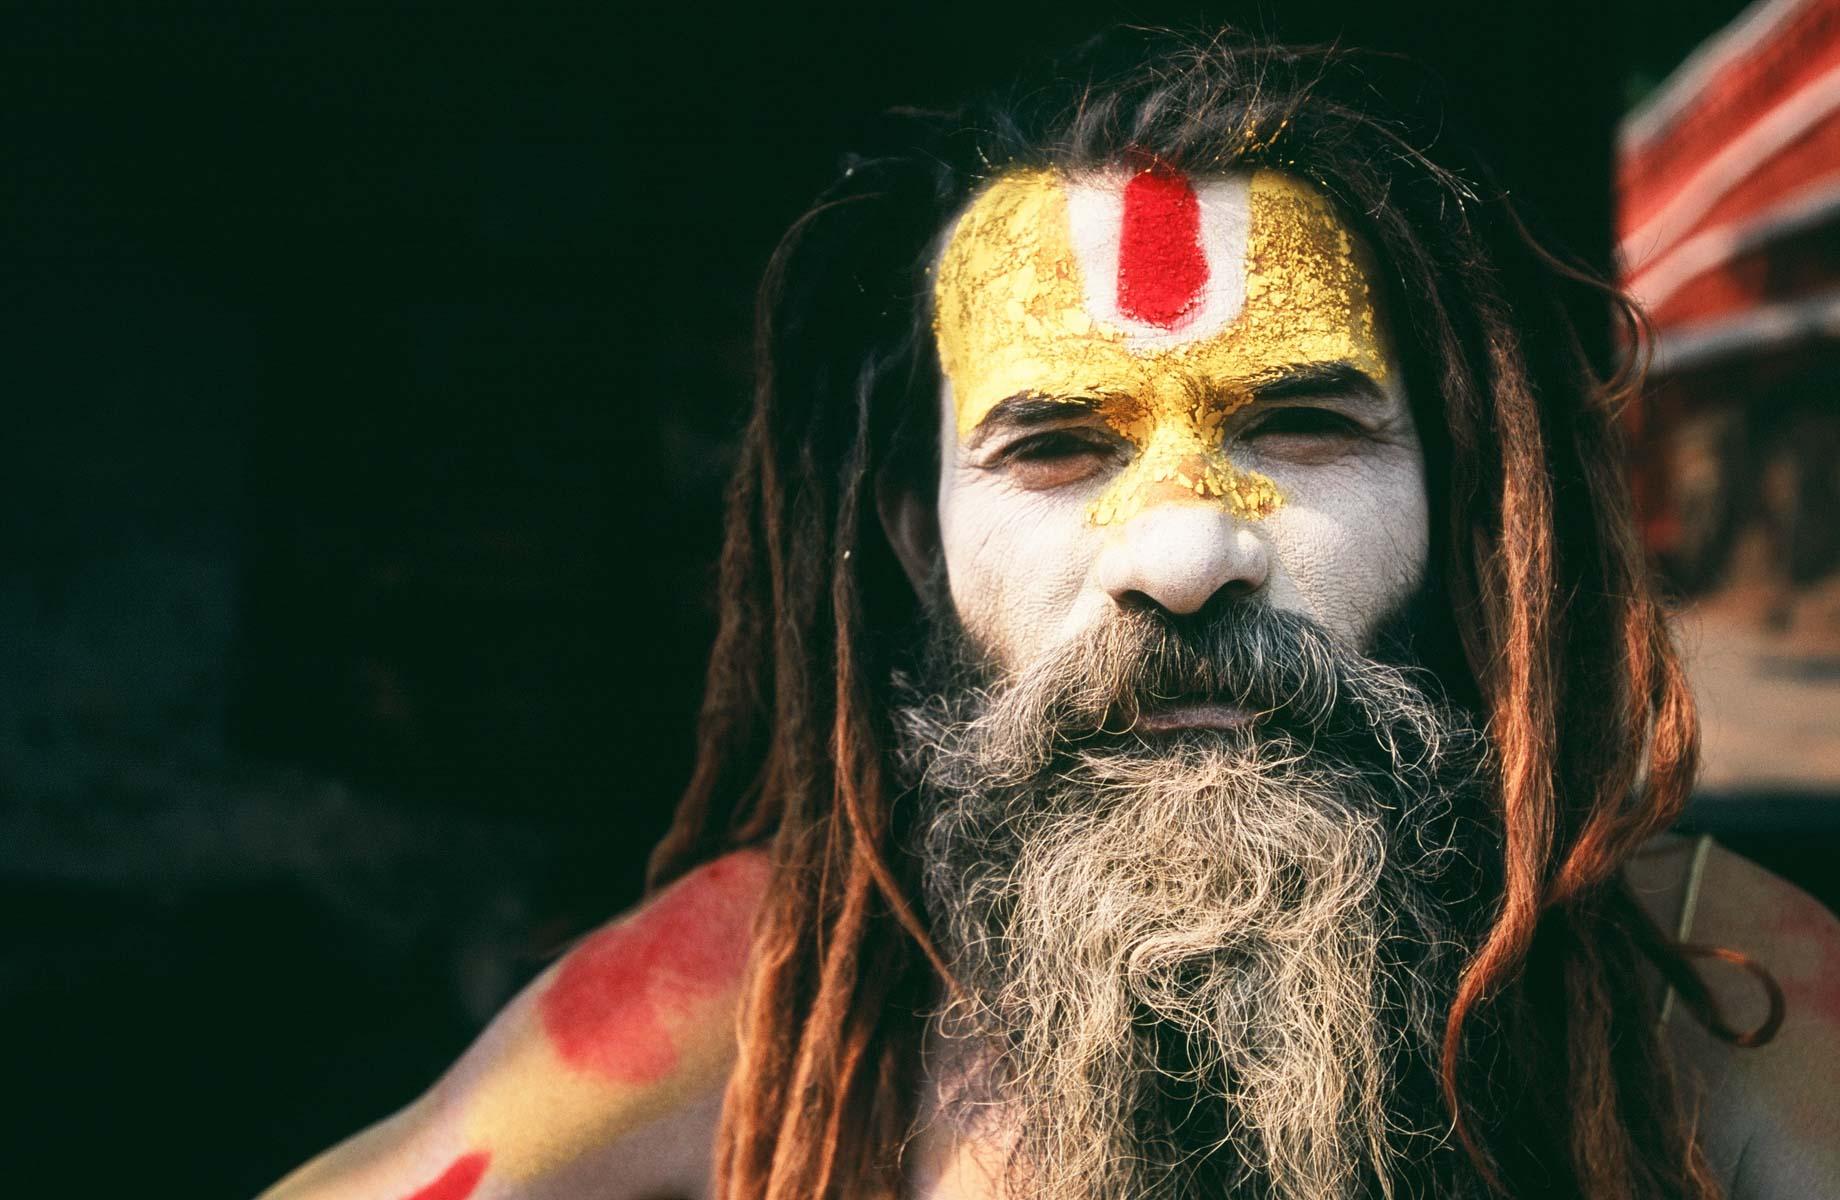 Tim Losch - Portrait of a Sadhu, Nepal